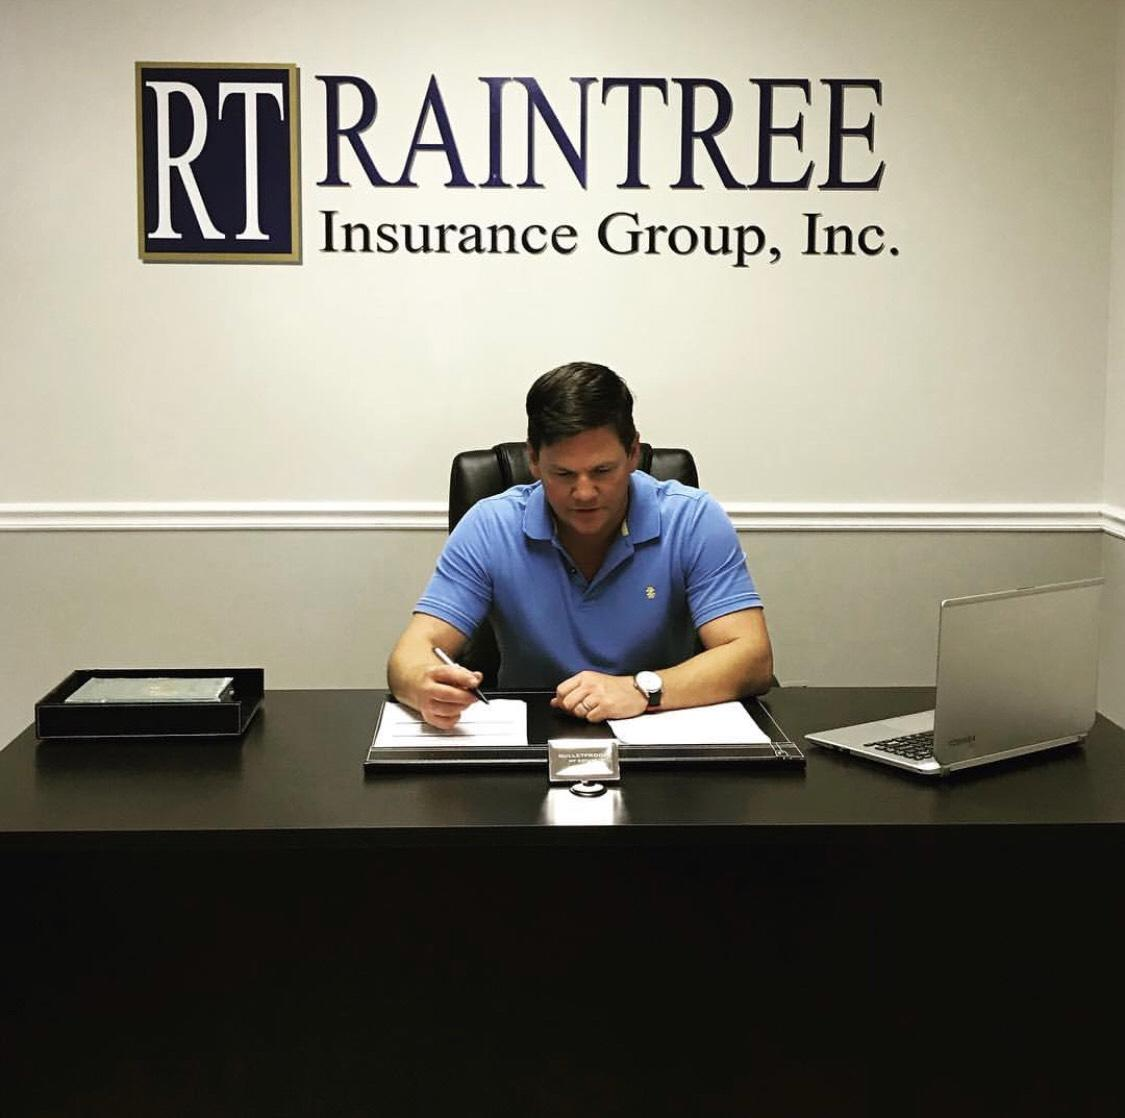 Raintree Insurance Group image 4